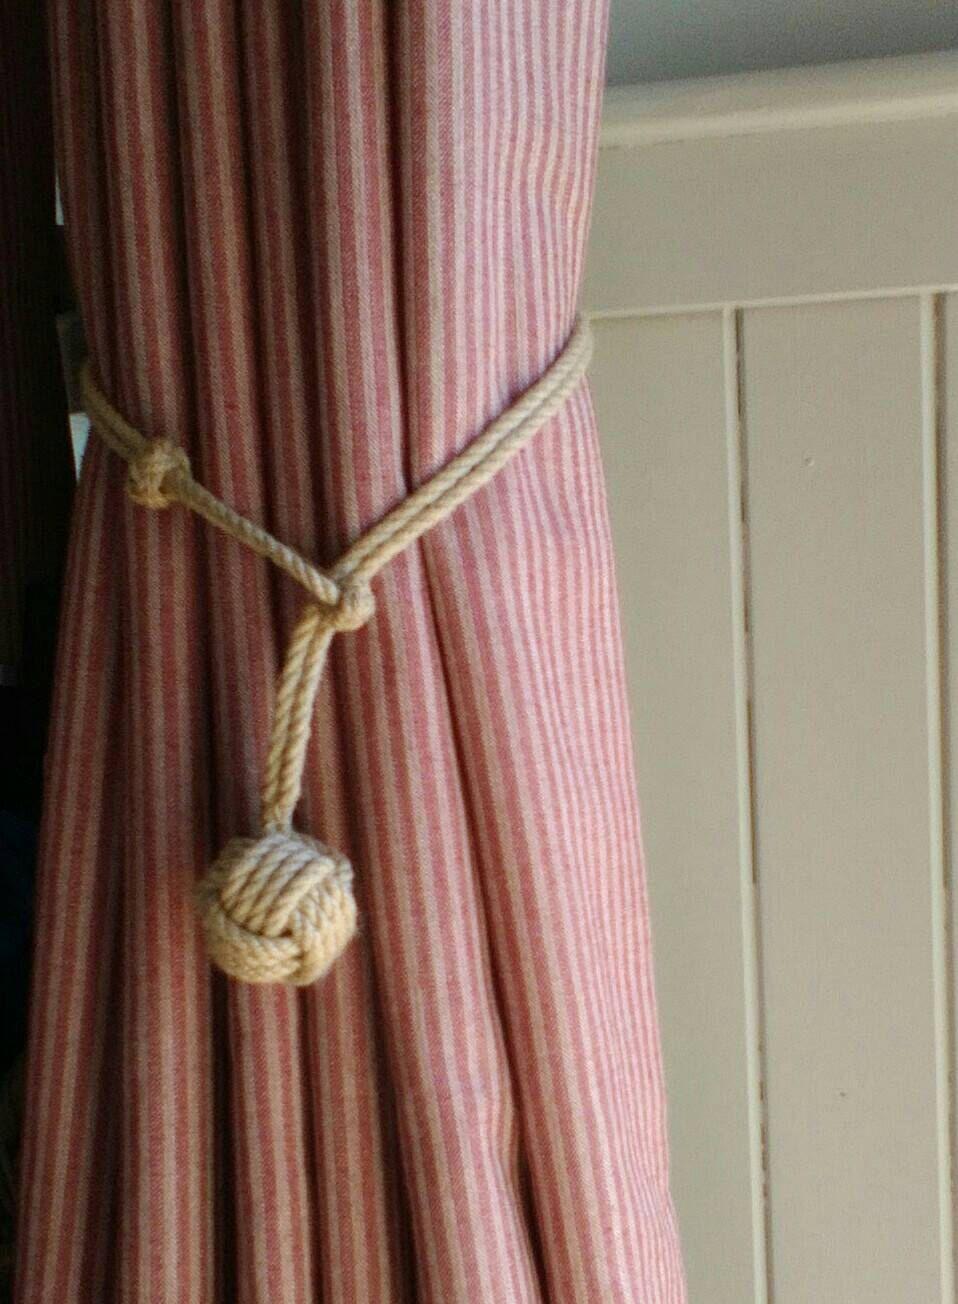 Nautical rope curtains - Nautical Rope Curtain Tie Handmade With Nautical Monkey S Fist And Turks Head Knots Beach